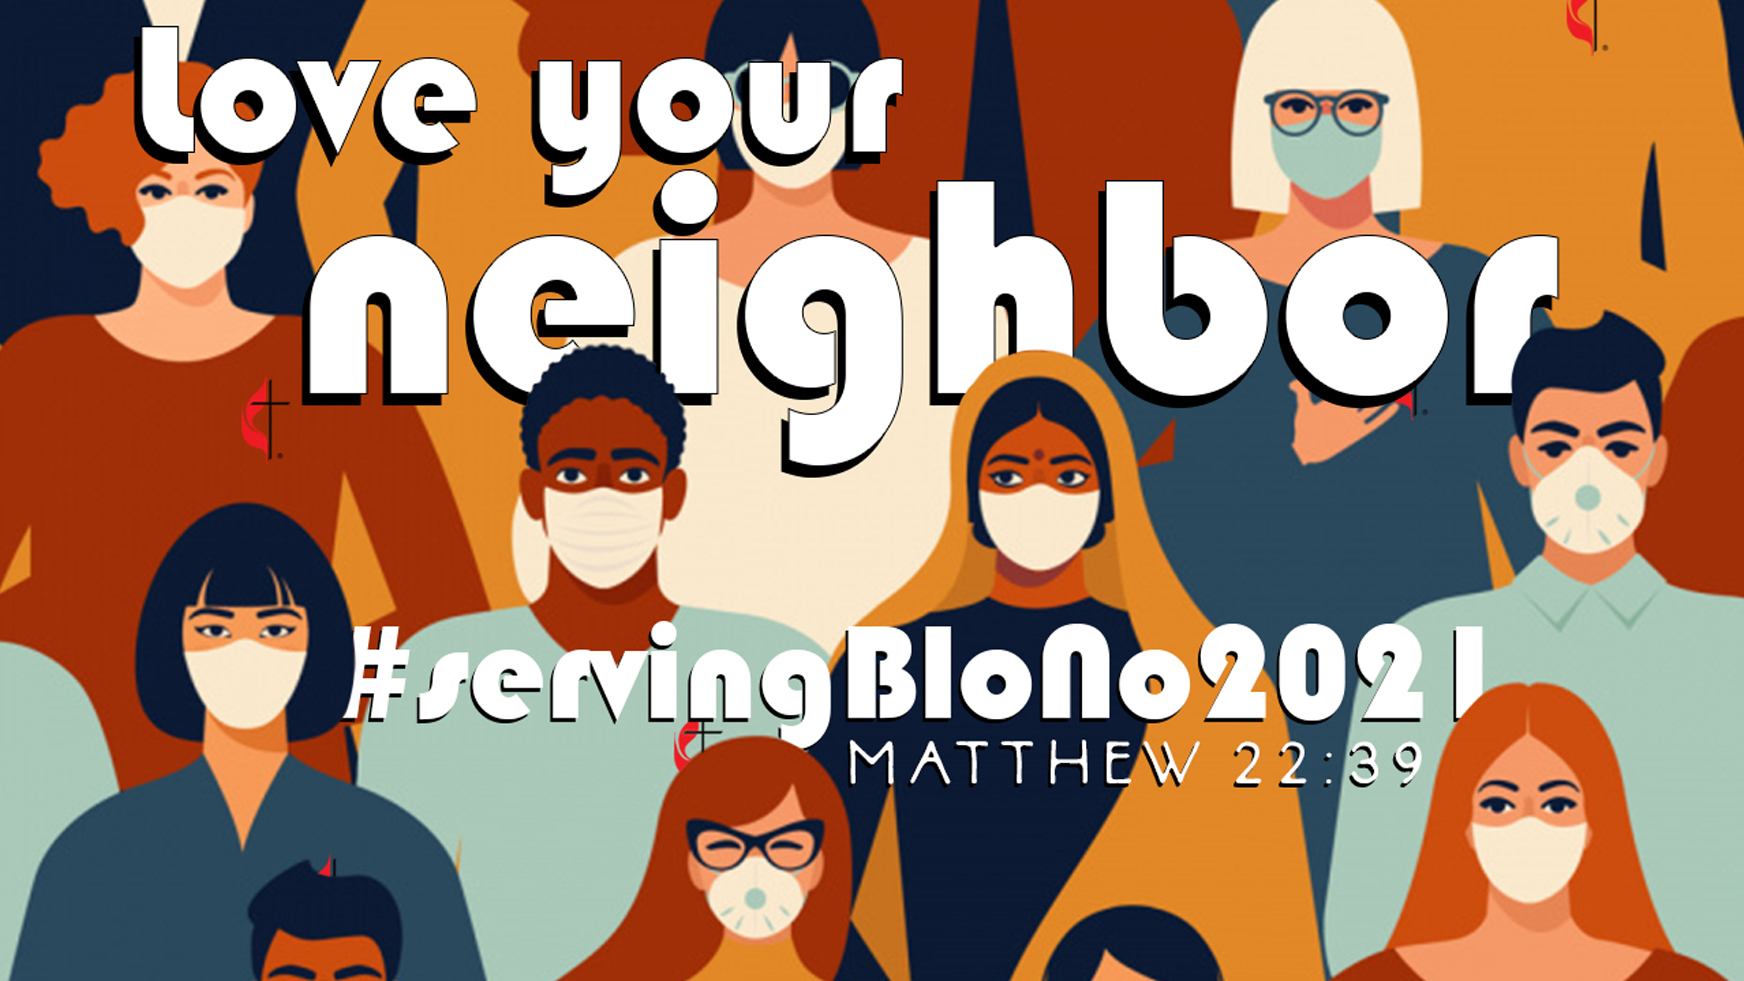 6-6-21 love your neighbor